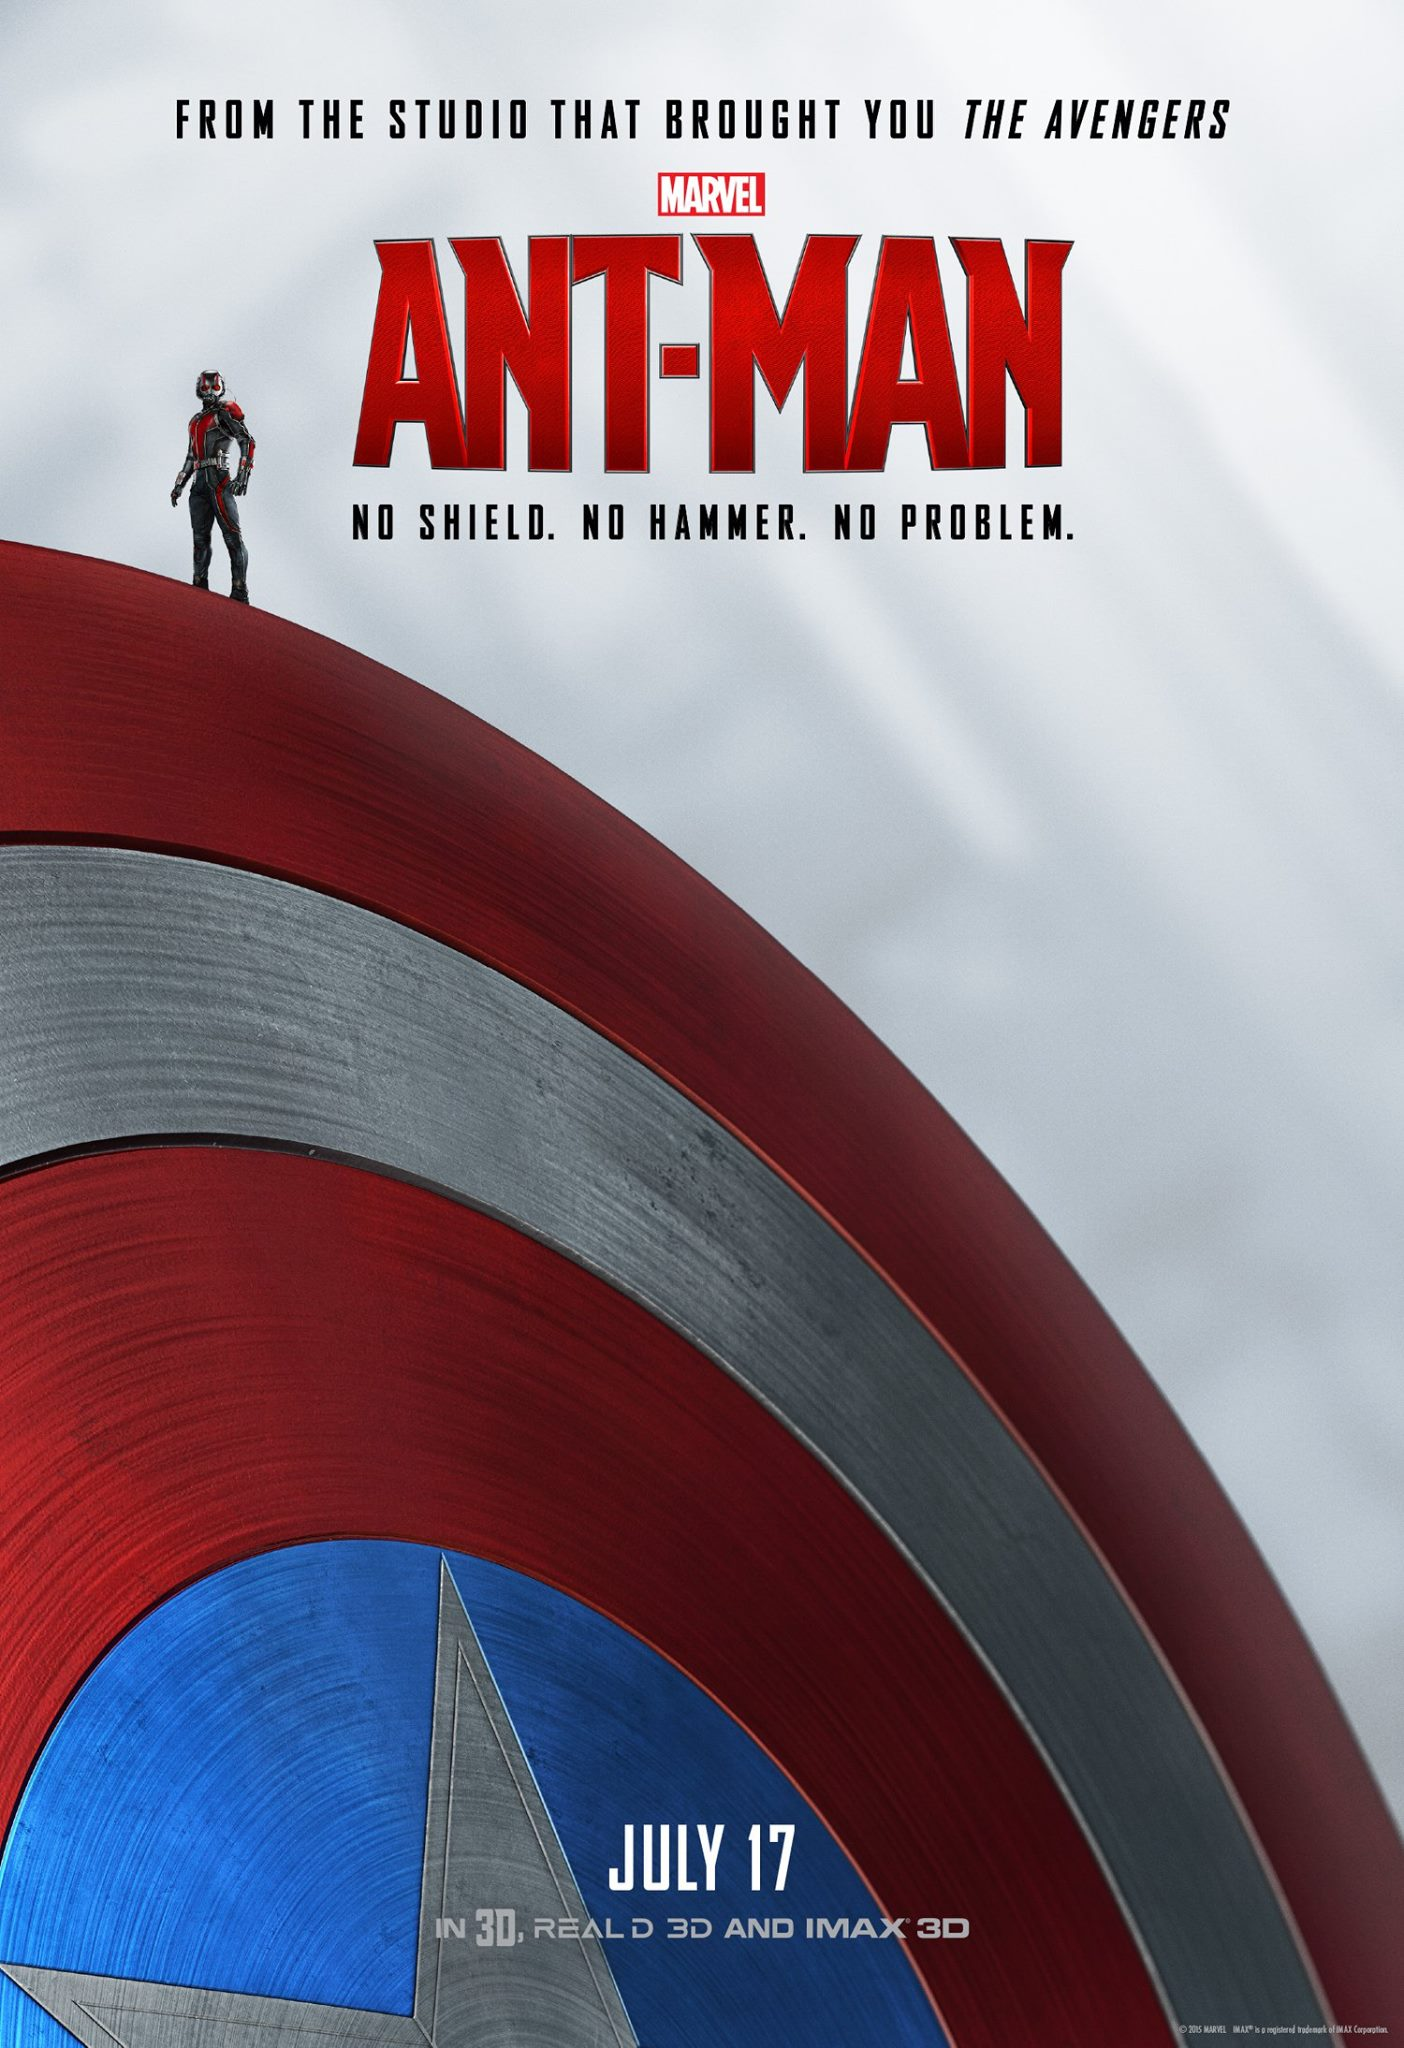 Ant-Man Captain America poster